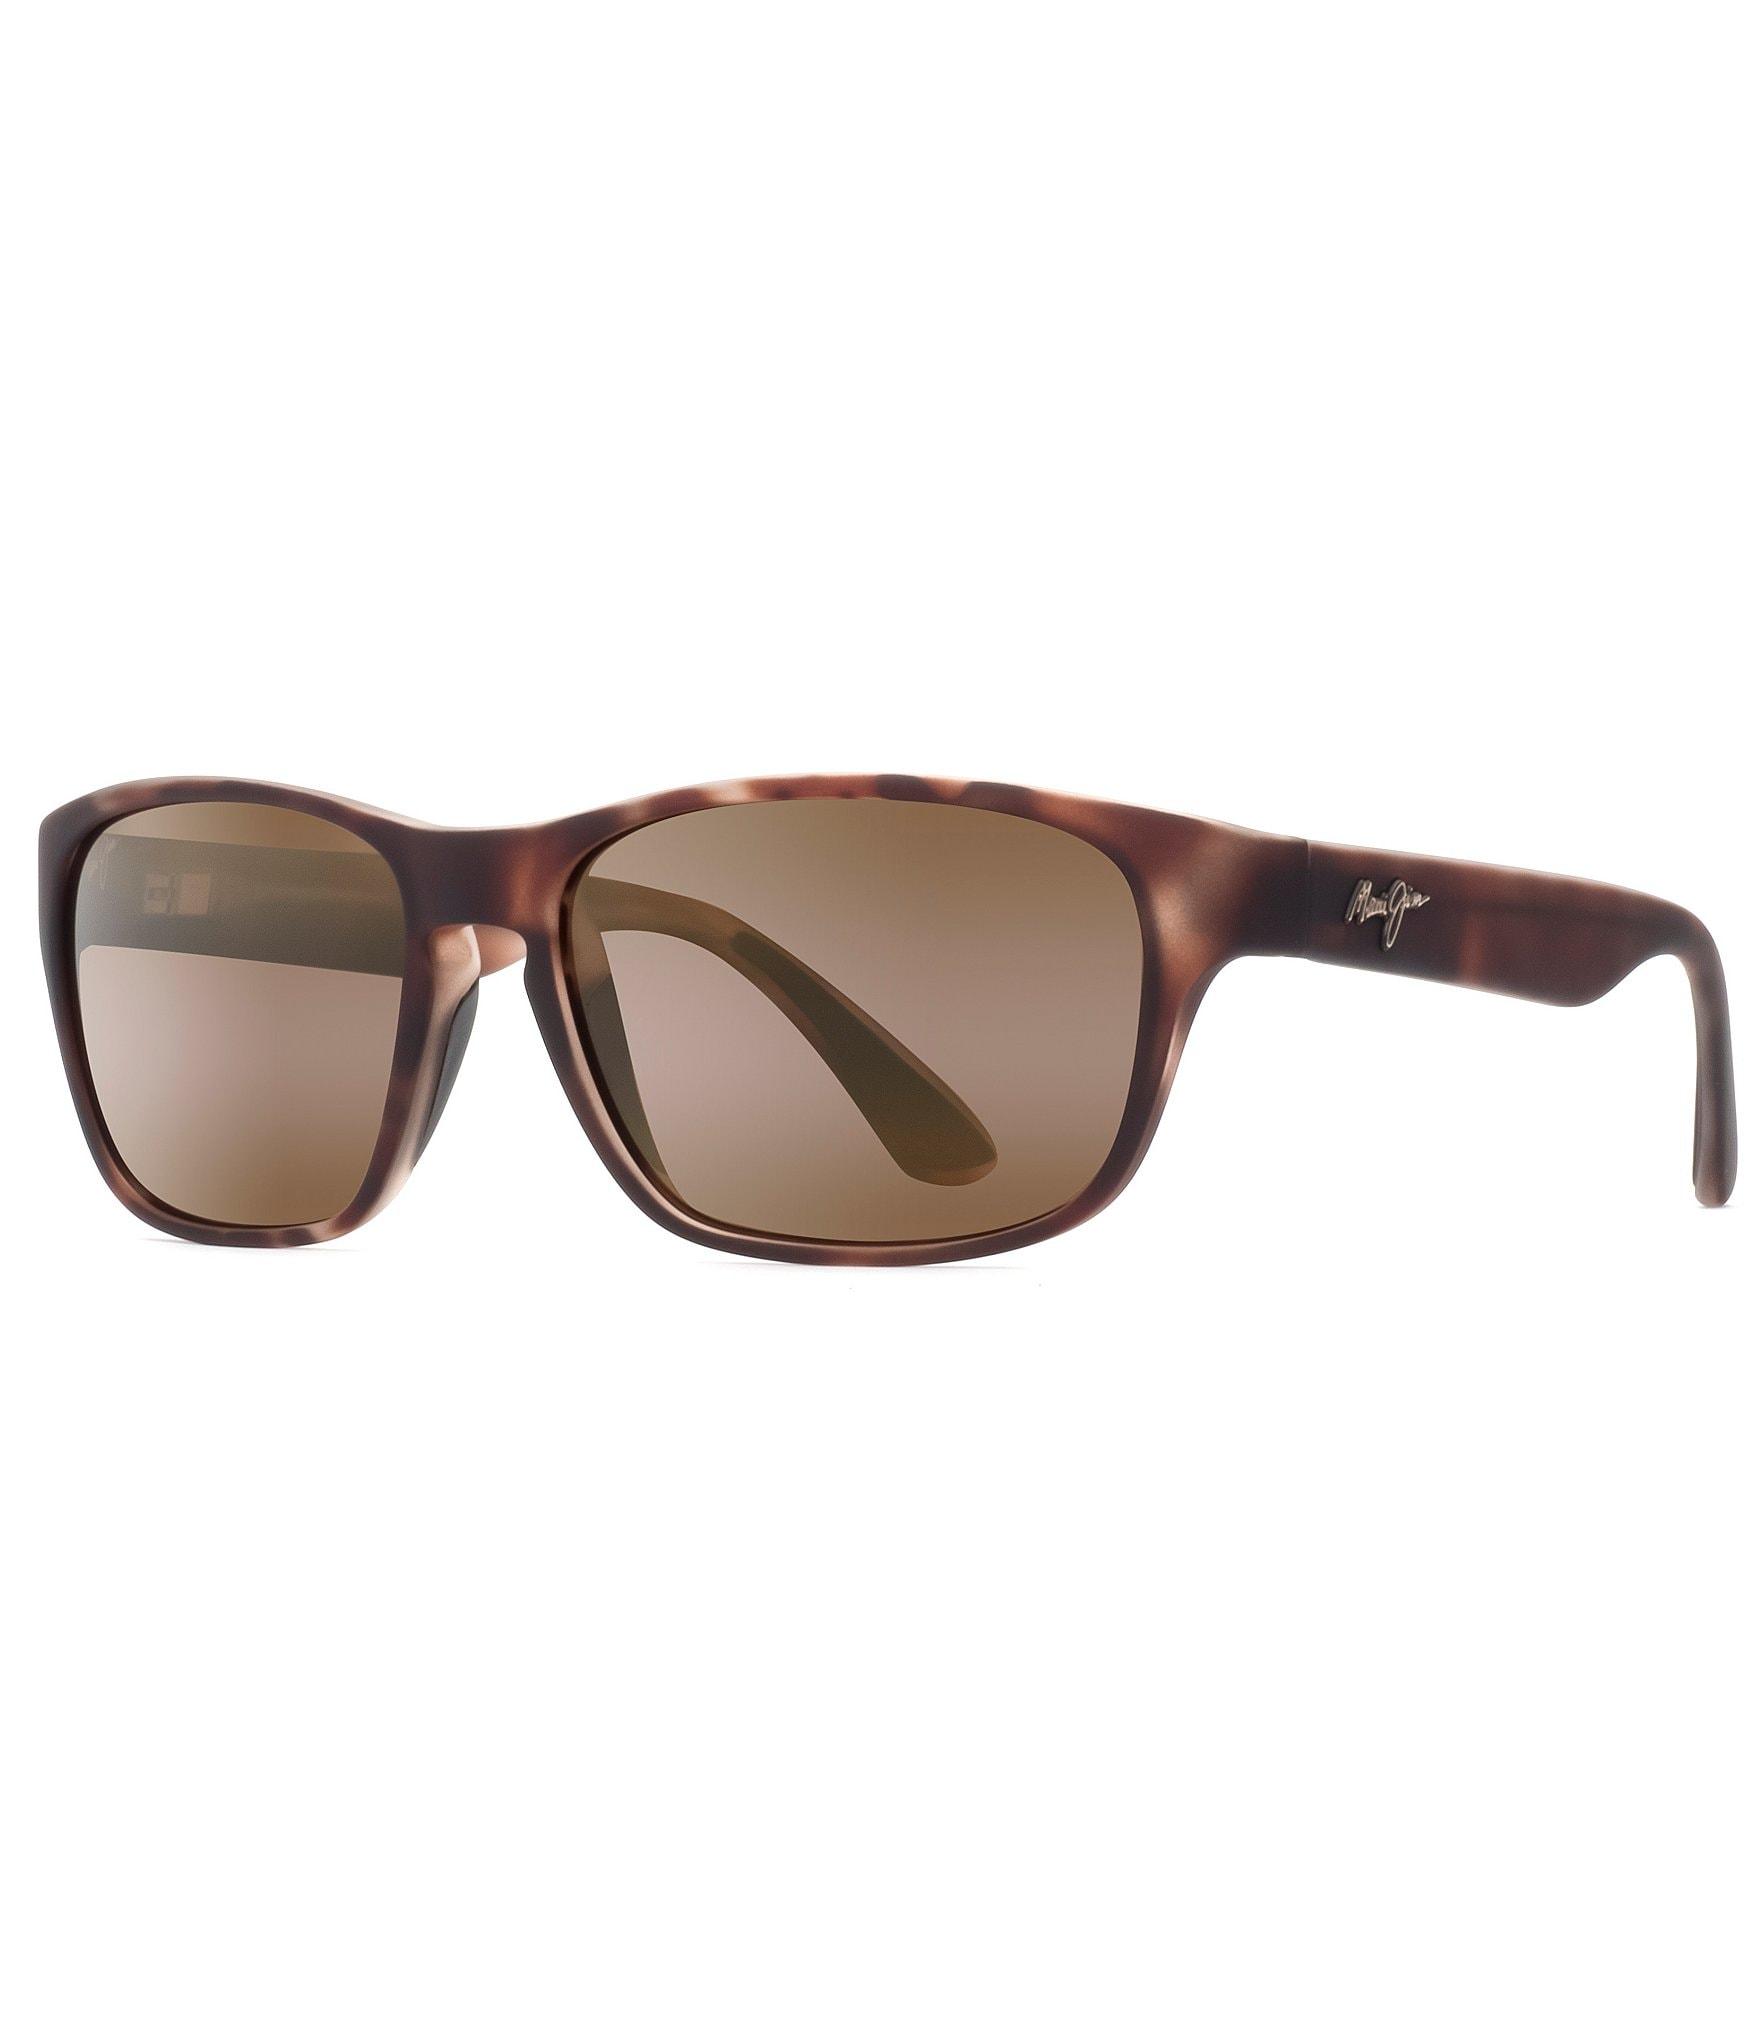 4ea66f12dd men's brown: Accessories: Jewelry, Watches & Sunglasses   Dillard's